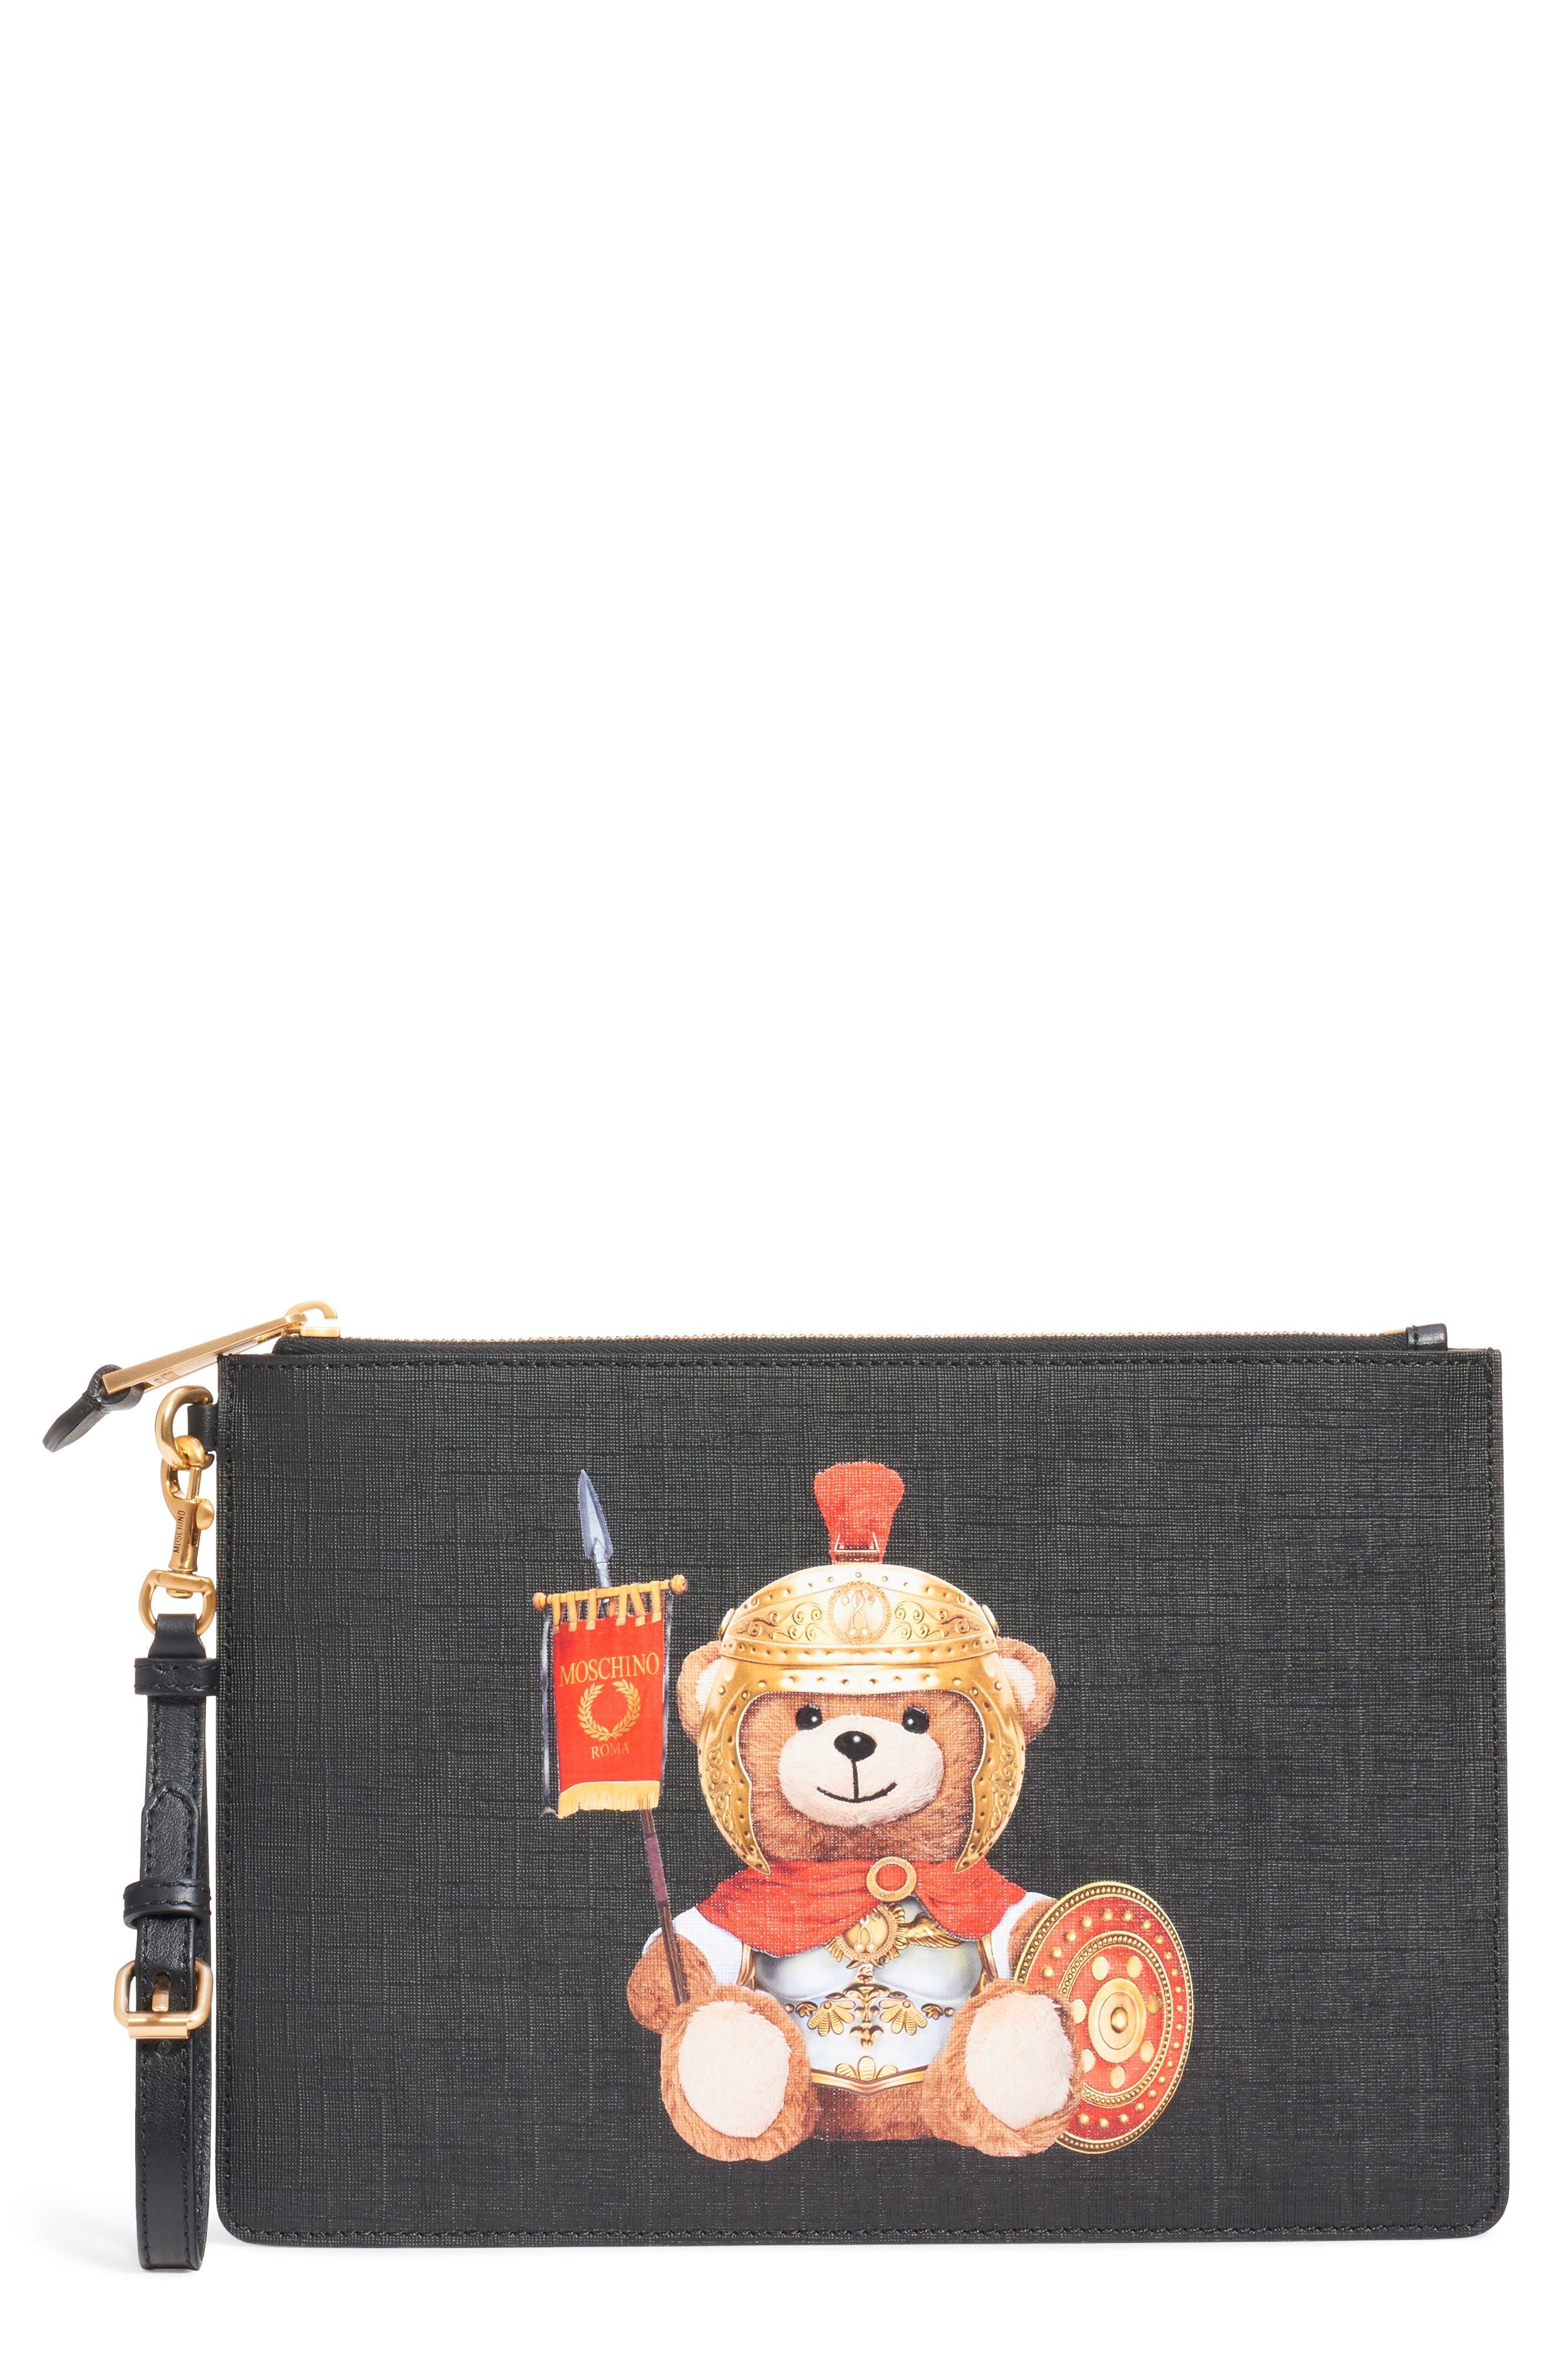 UPC 820771815005 product image for Moschino Gladiator Teddy Pouch - Black   upcitemdb.com